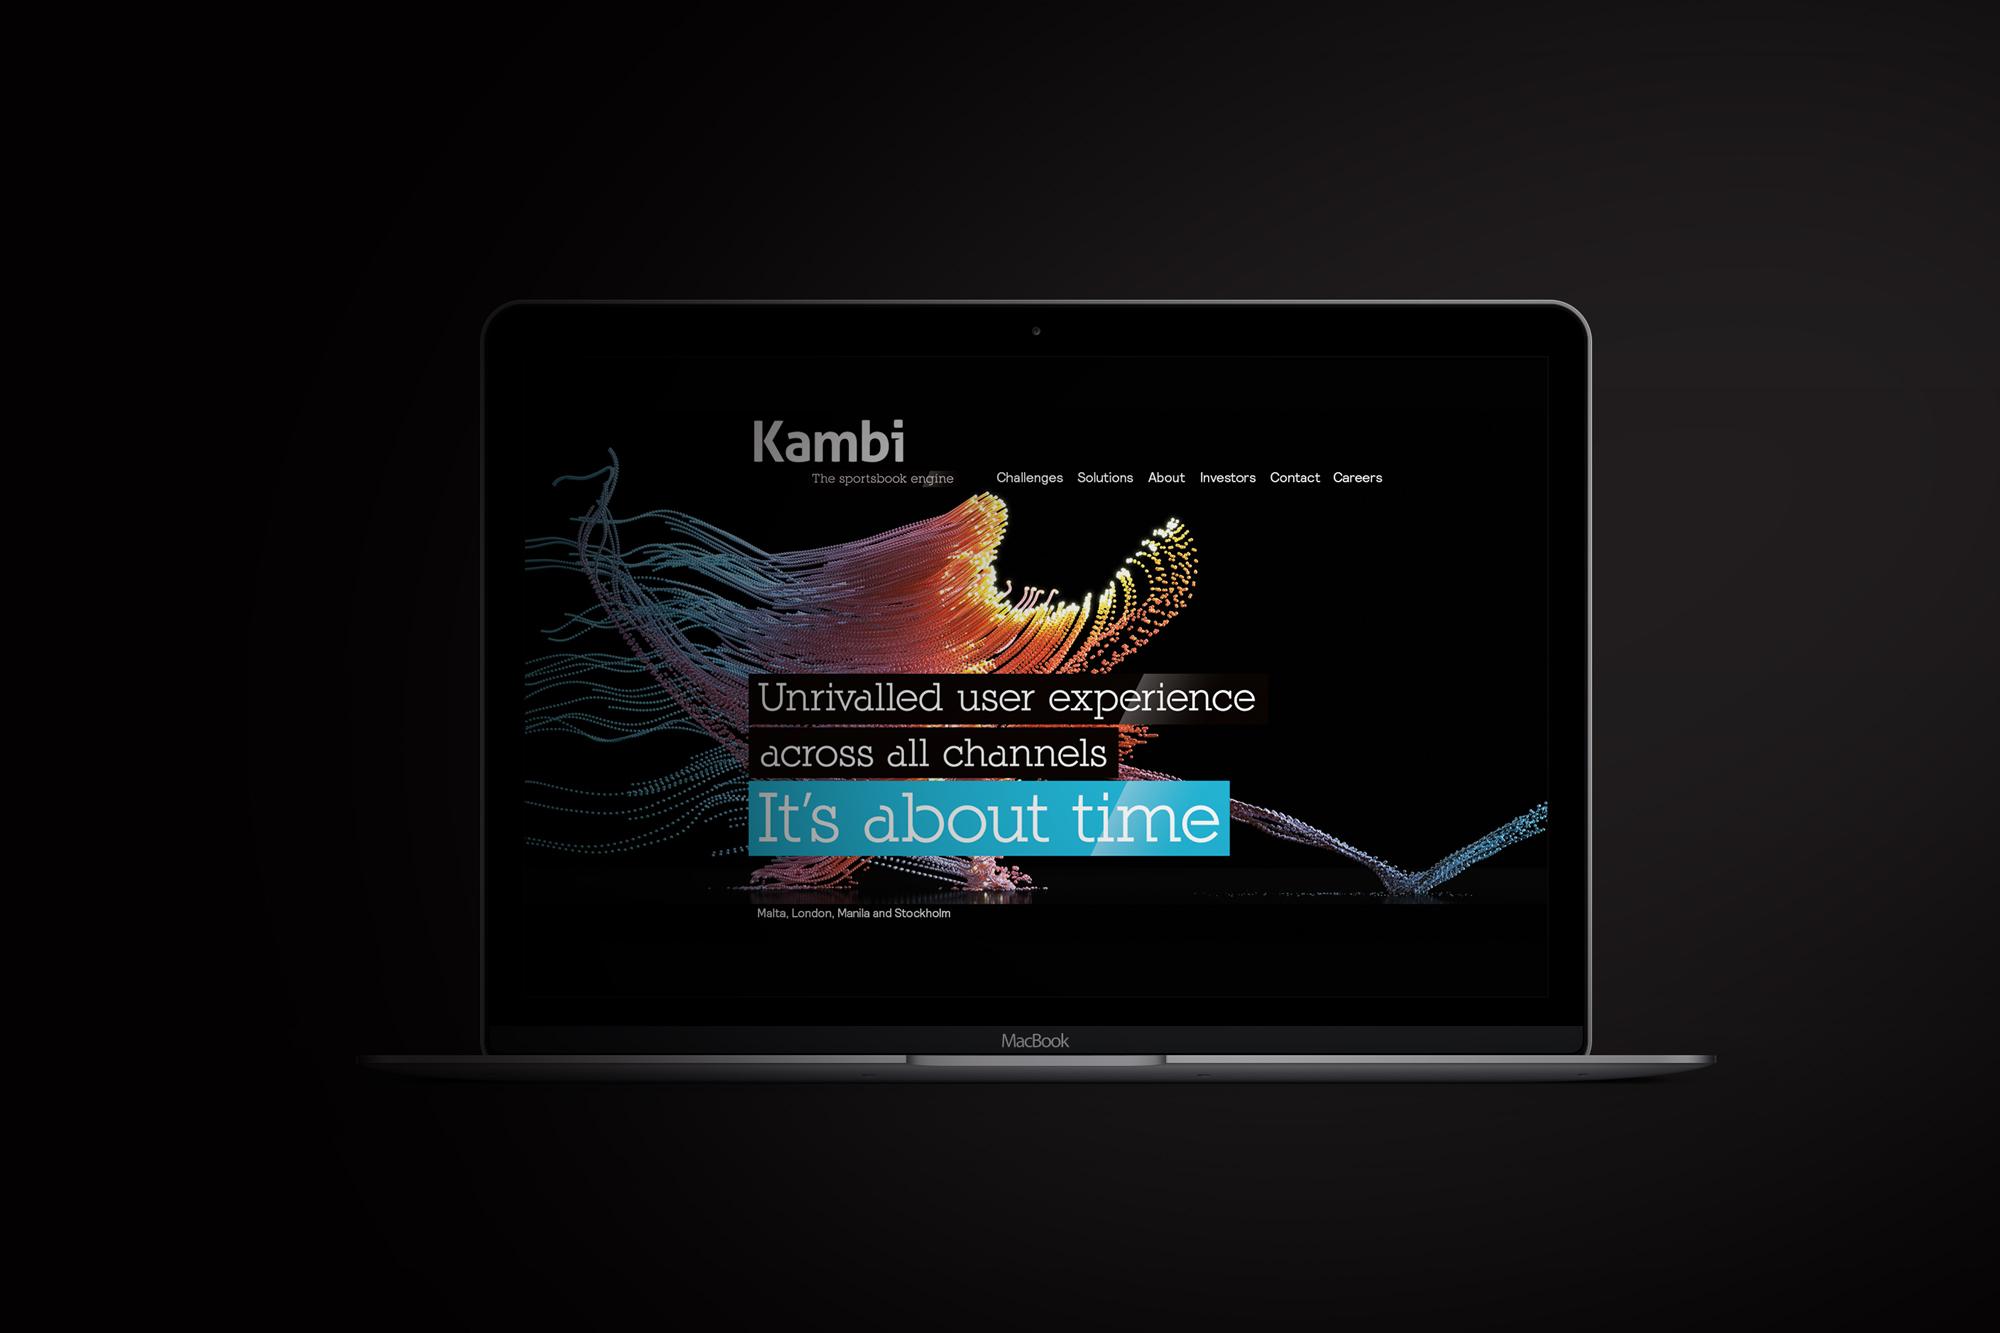 Kambi_CaseStudies_IMAGES_1.jpg